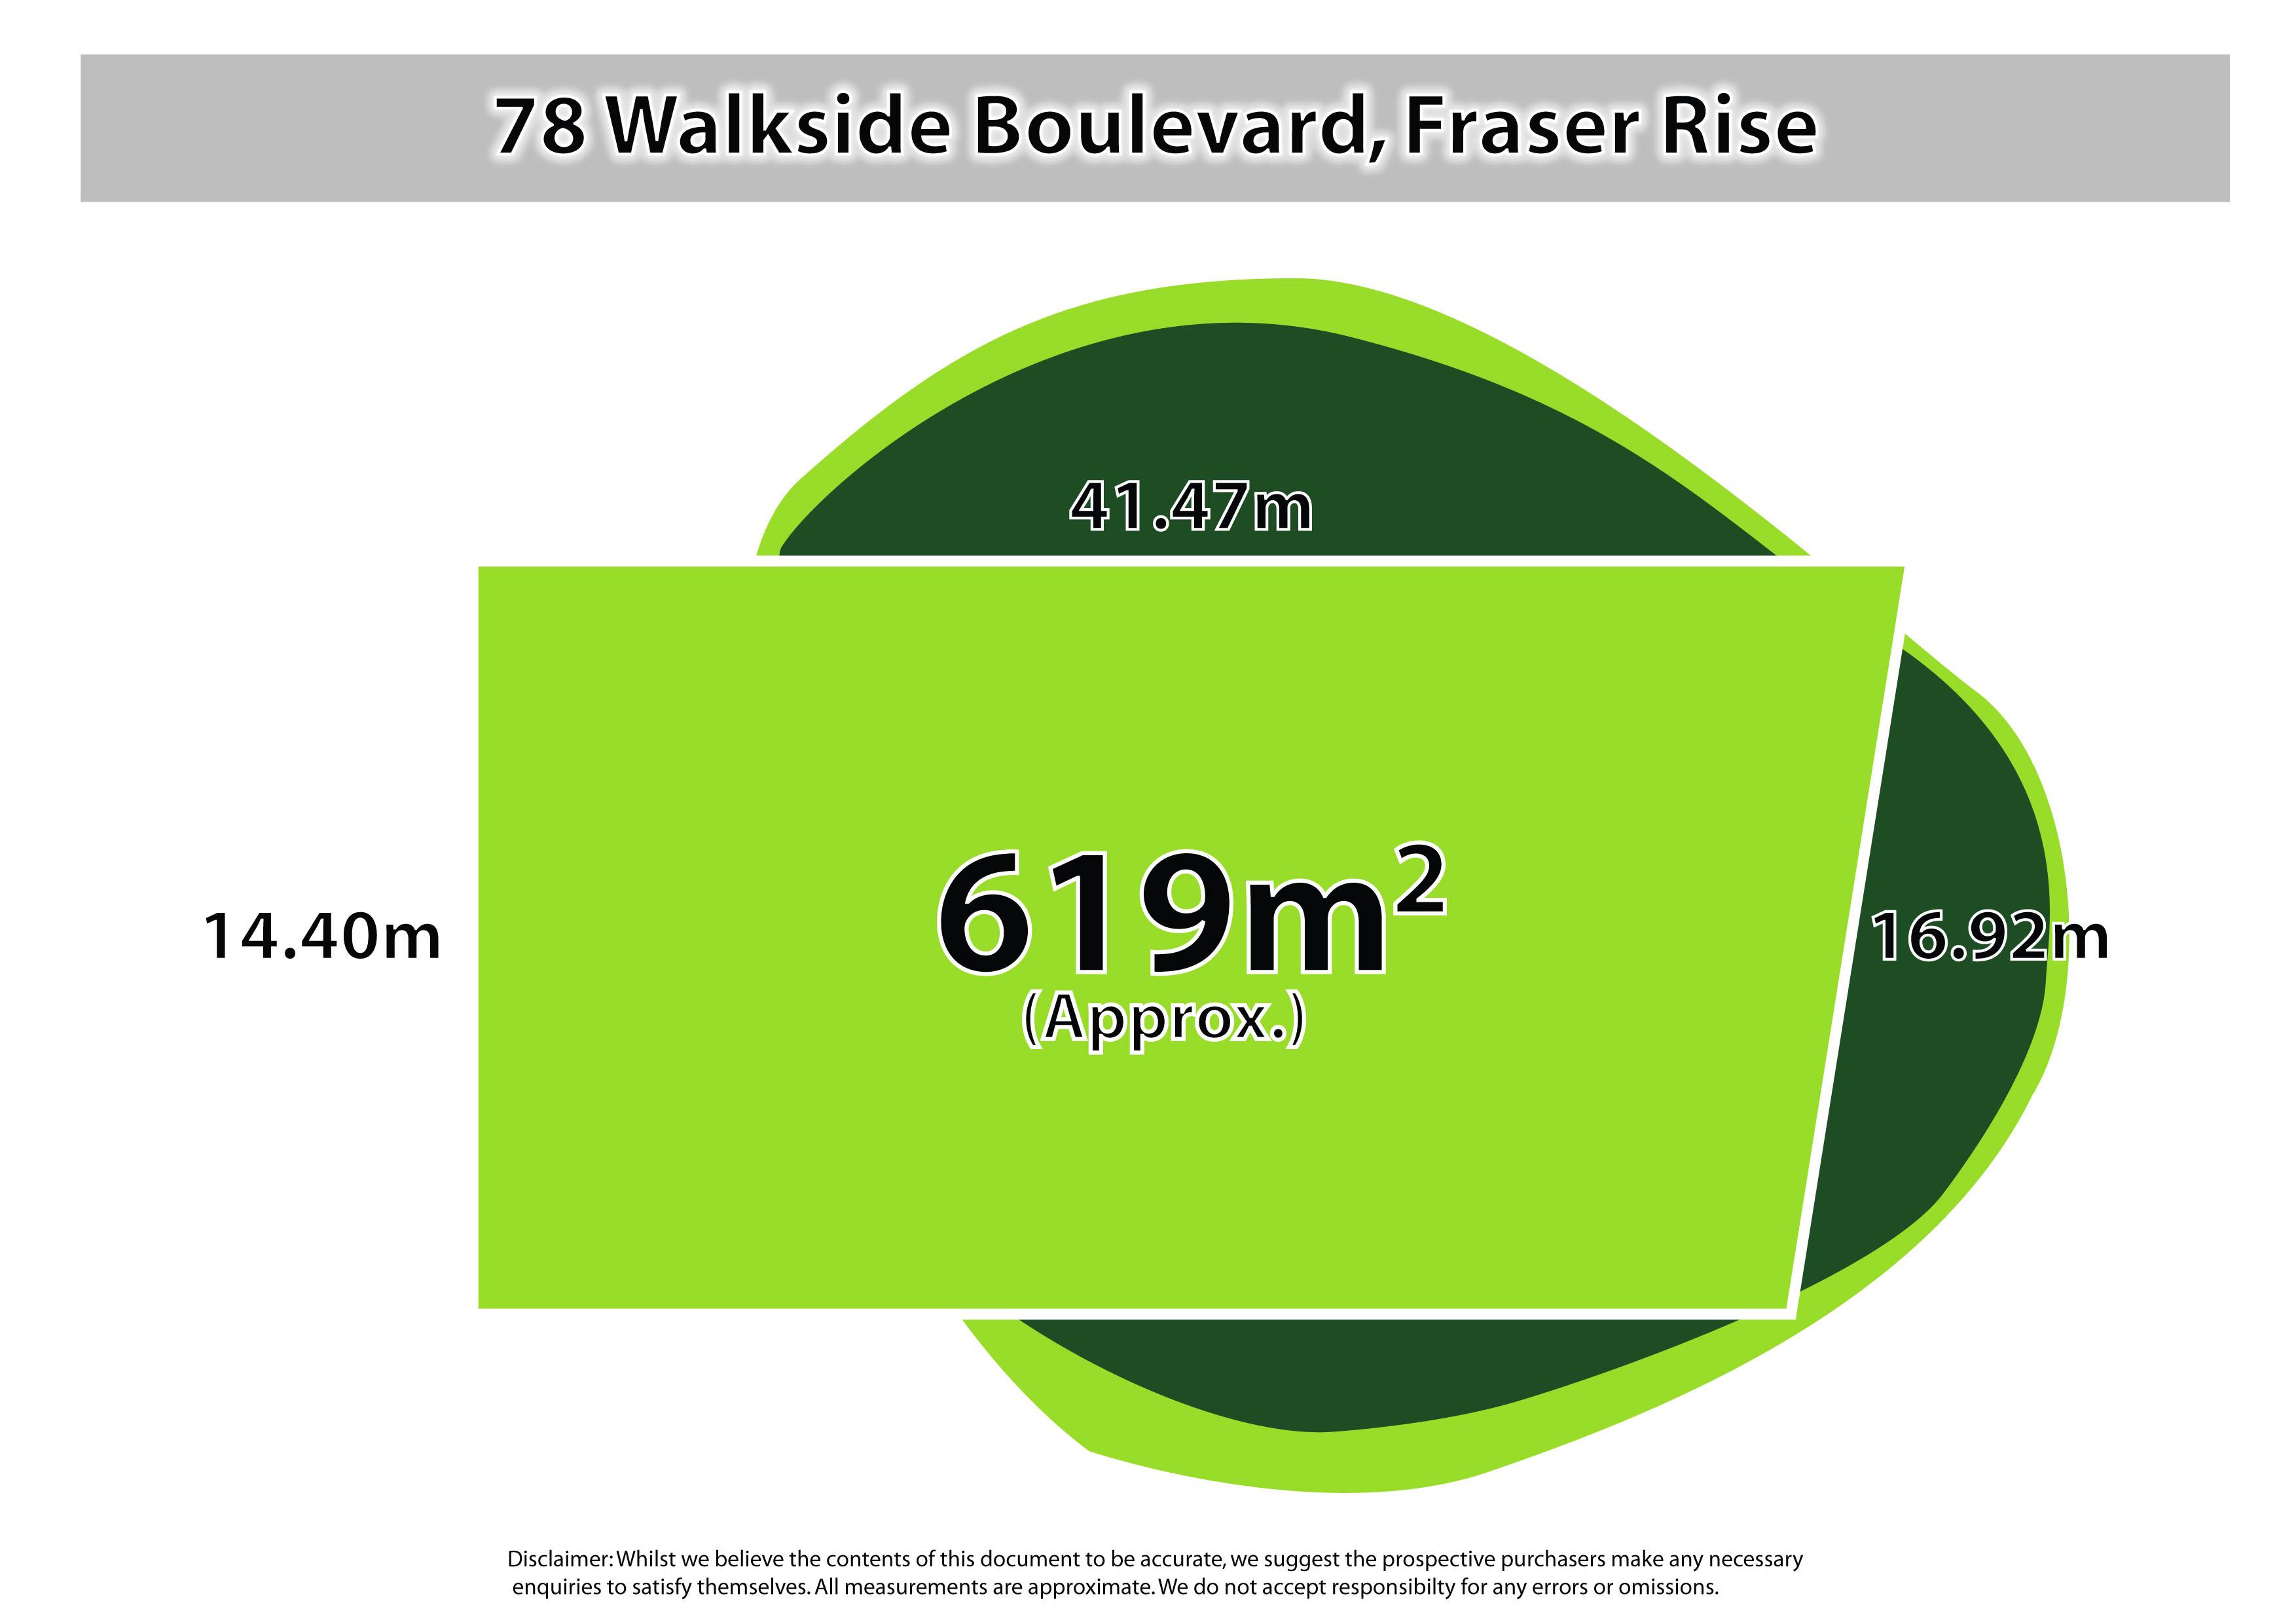 78 Walkside Boulevard, Fraser Rise